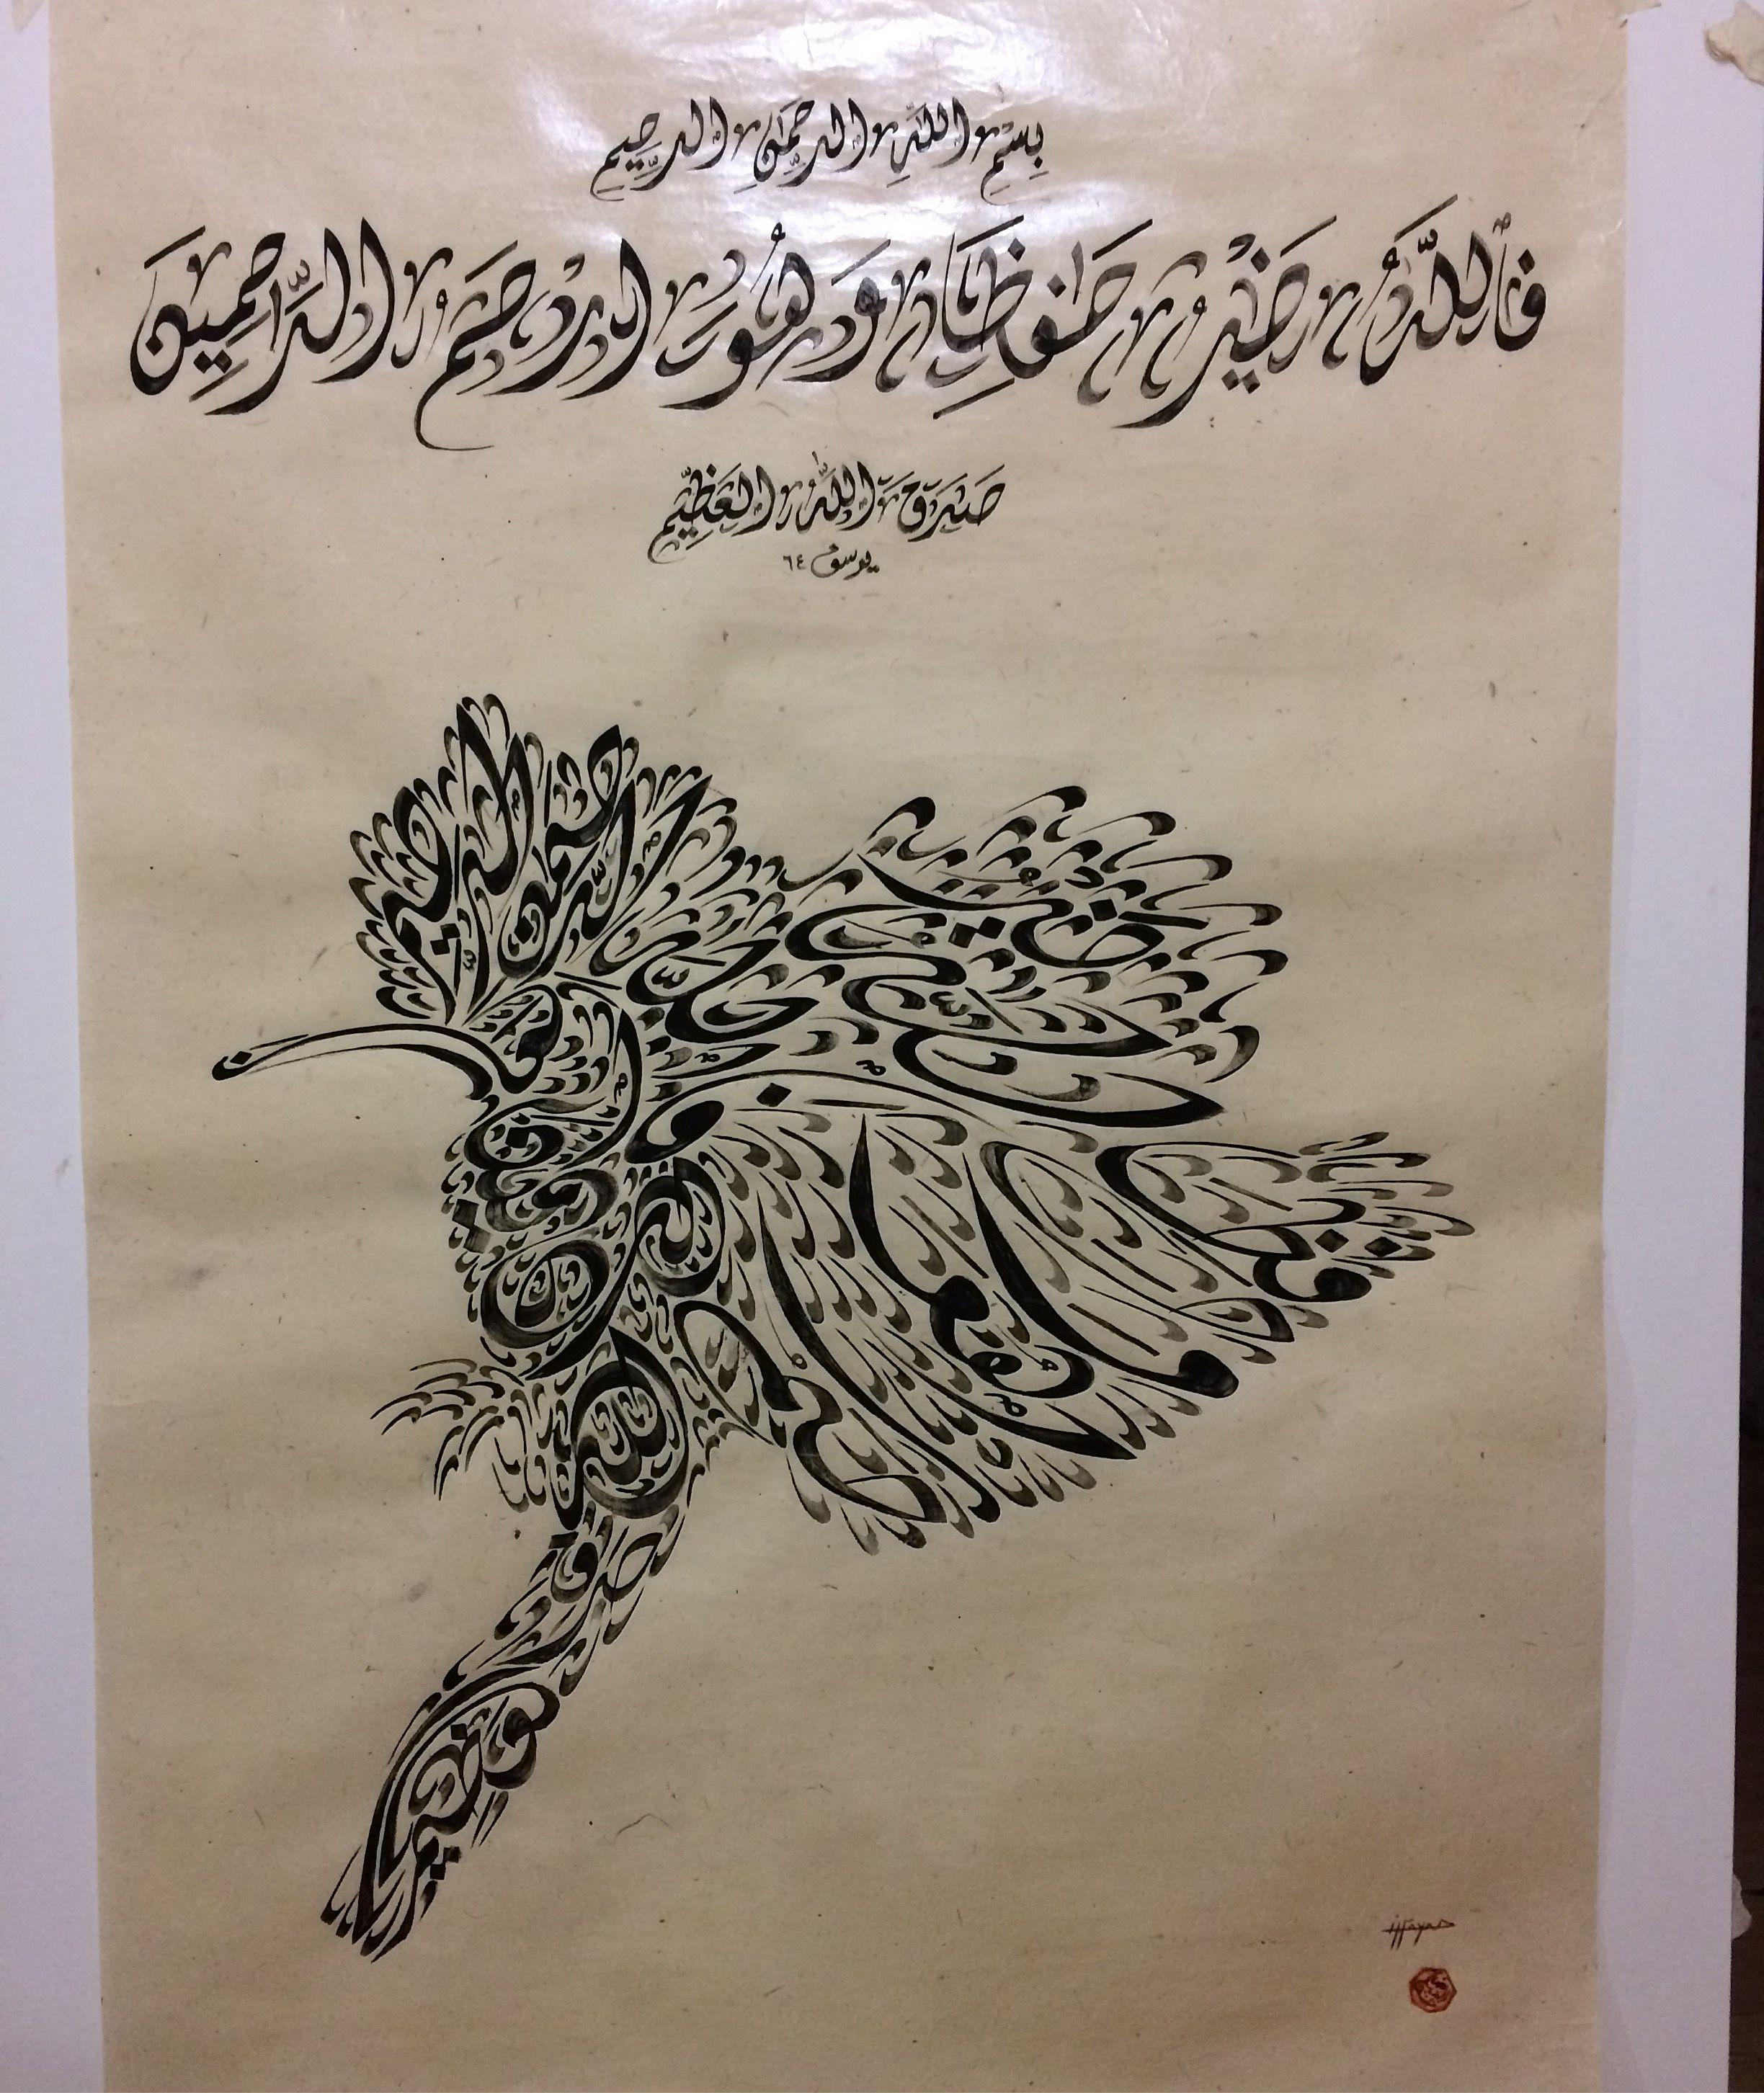 Color art dubai -  Islamic Calligraphy Drawing Art Flying Hoopoe Bird Black